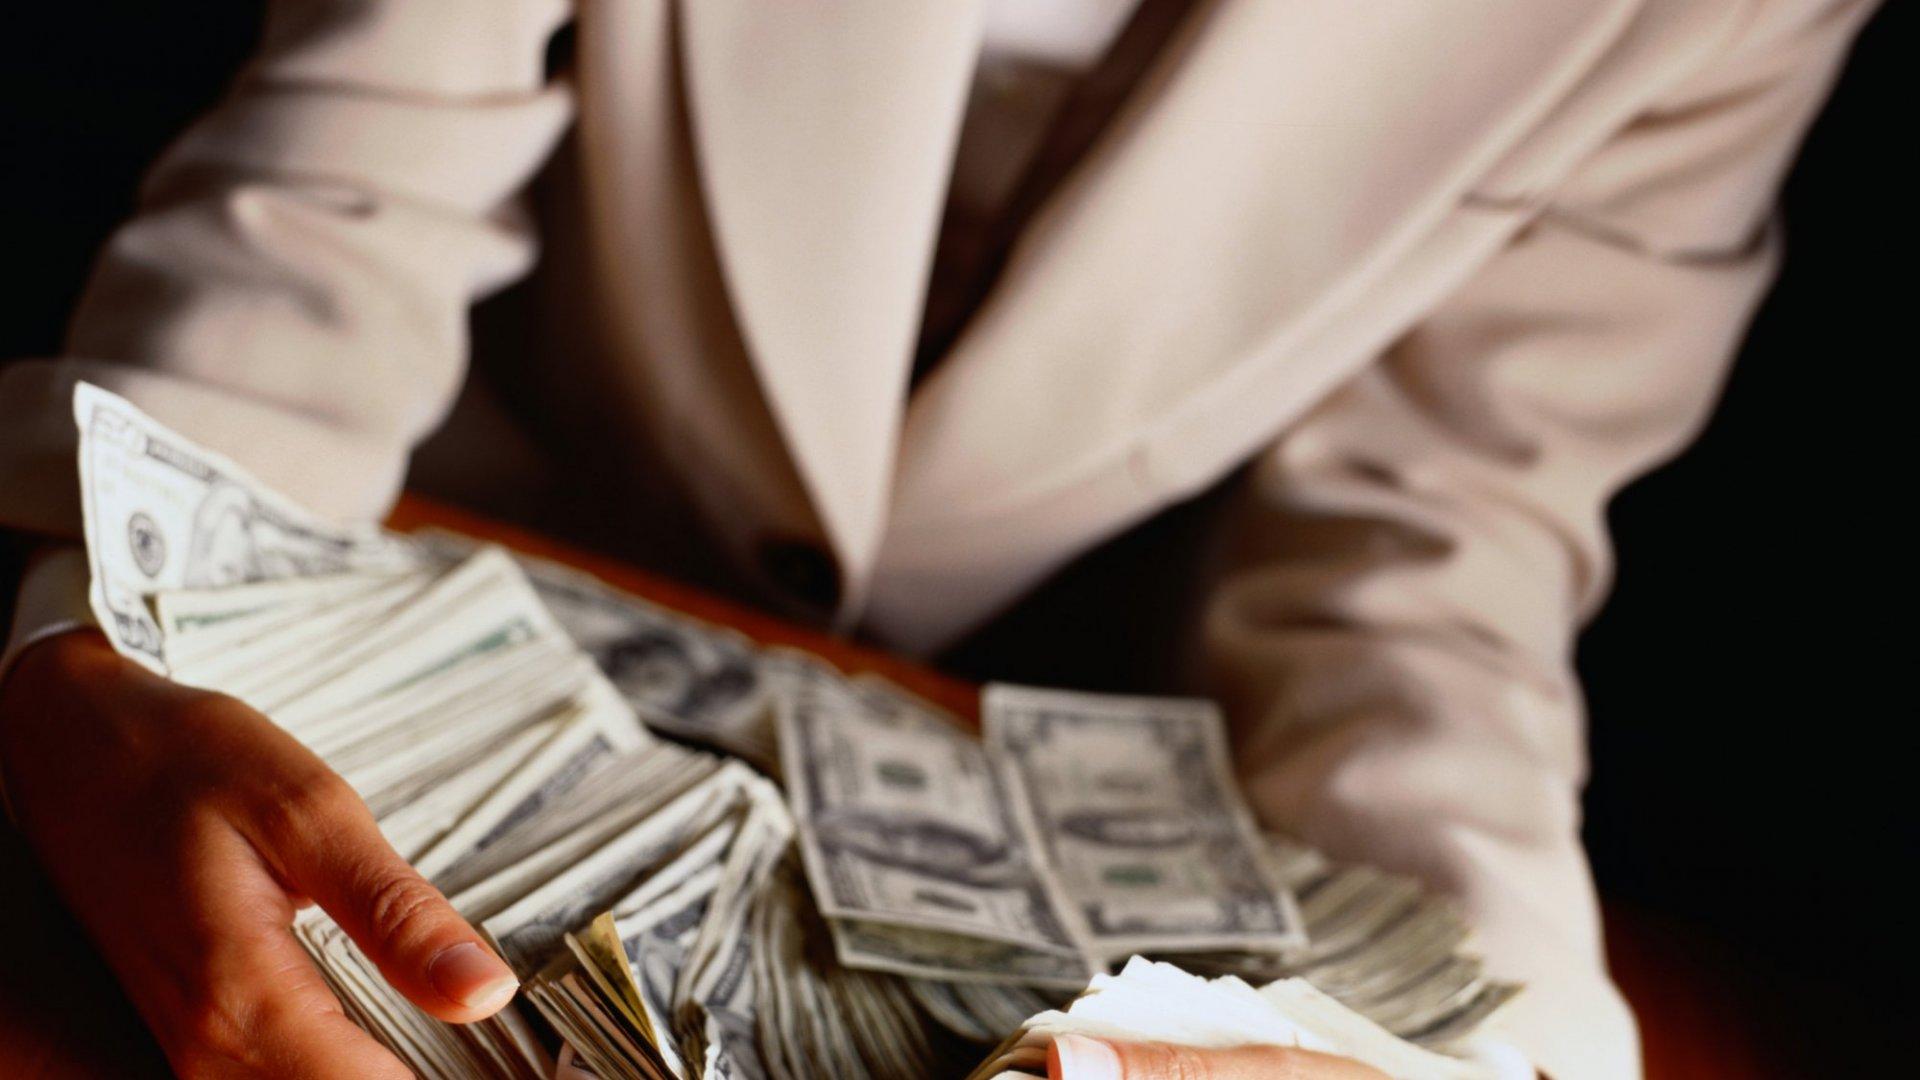 The $603 Billion Loophole That Cost 12 Million Jobs Last Year